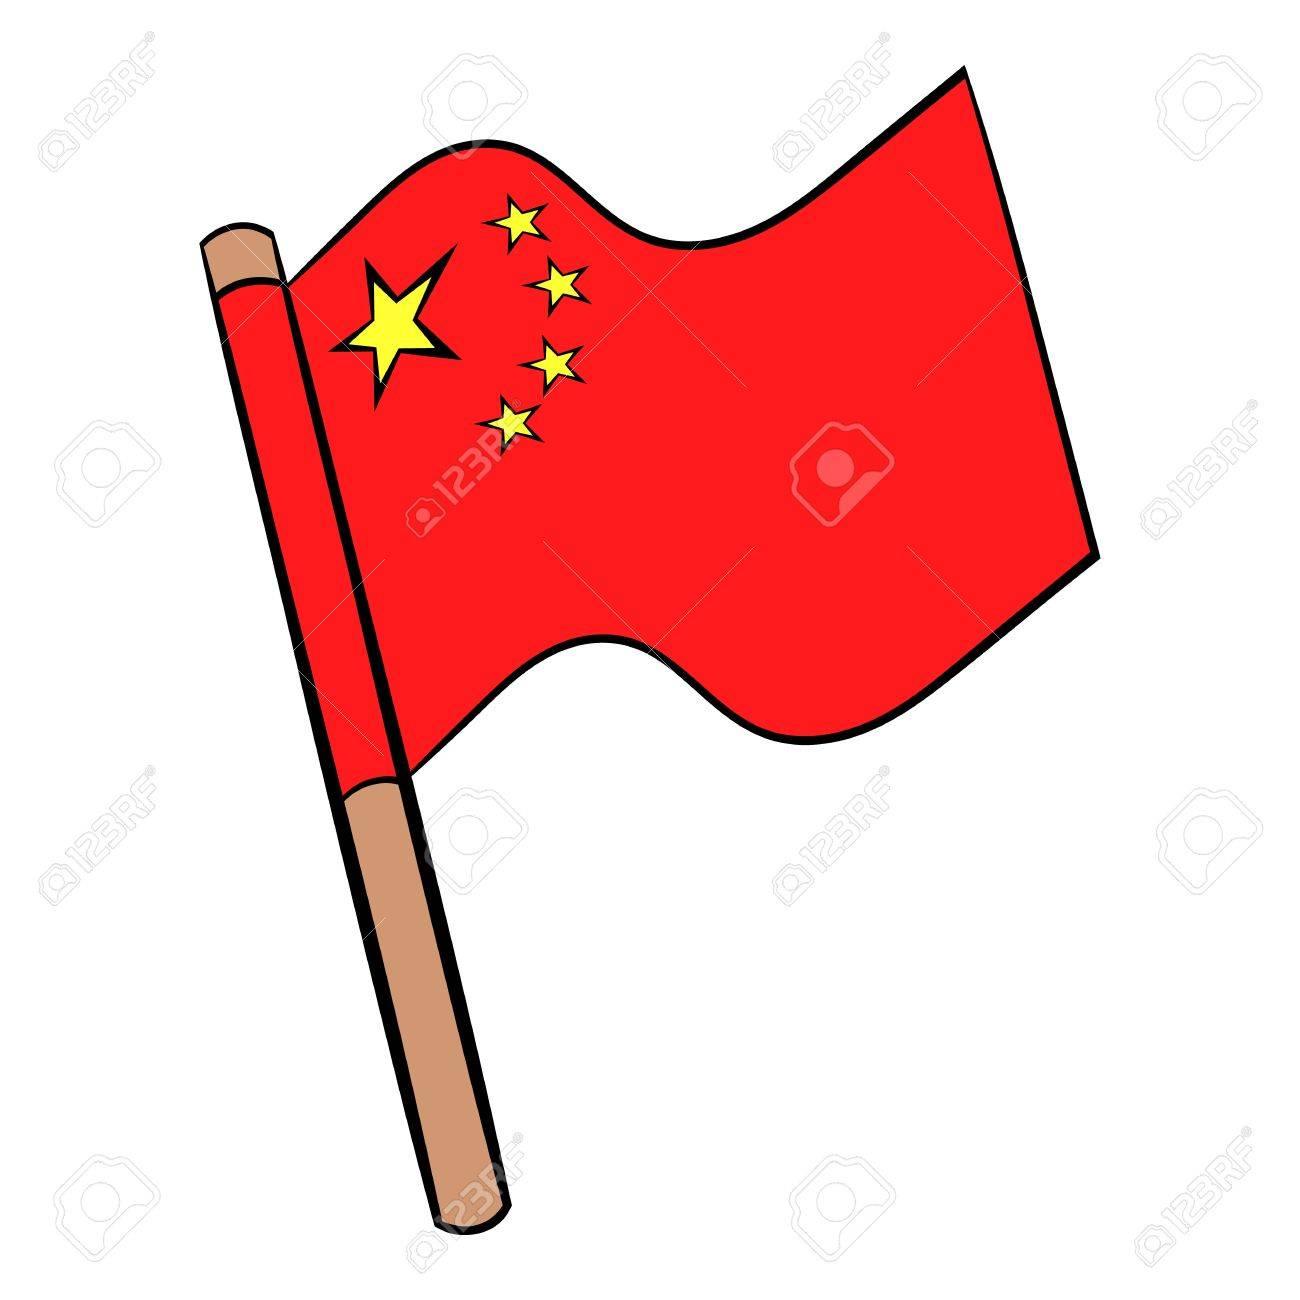 Flag Of China Icon Cartoon Royalty Free Cliparts Vectors And Stock Illustration Image 74346049